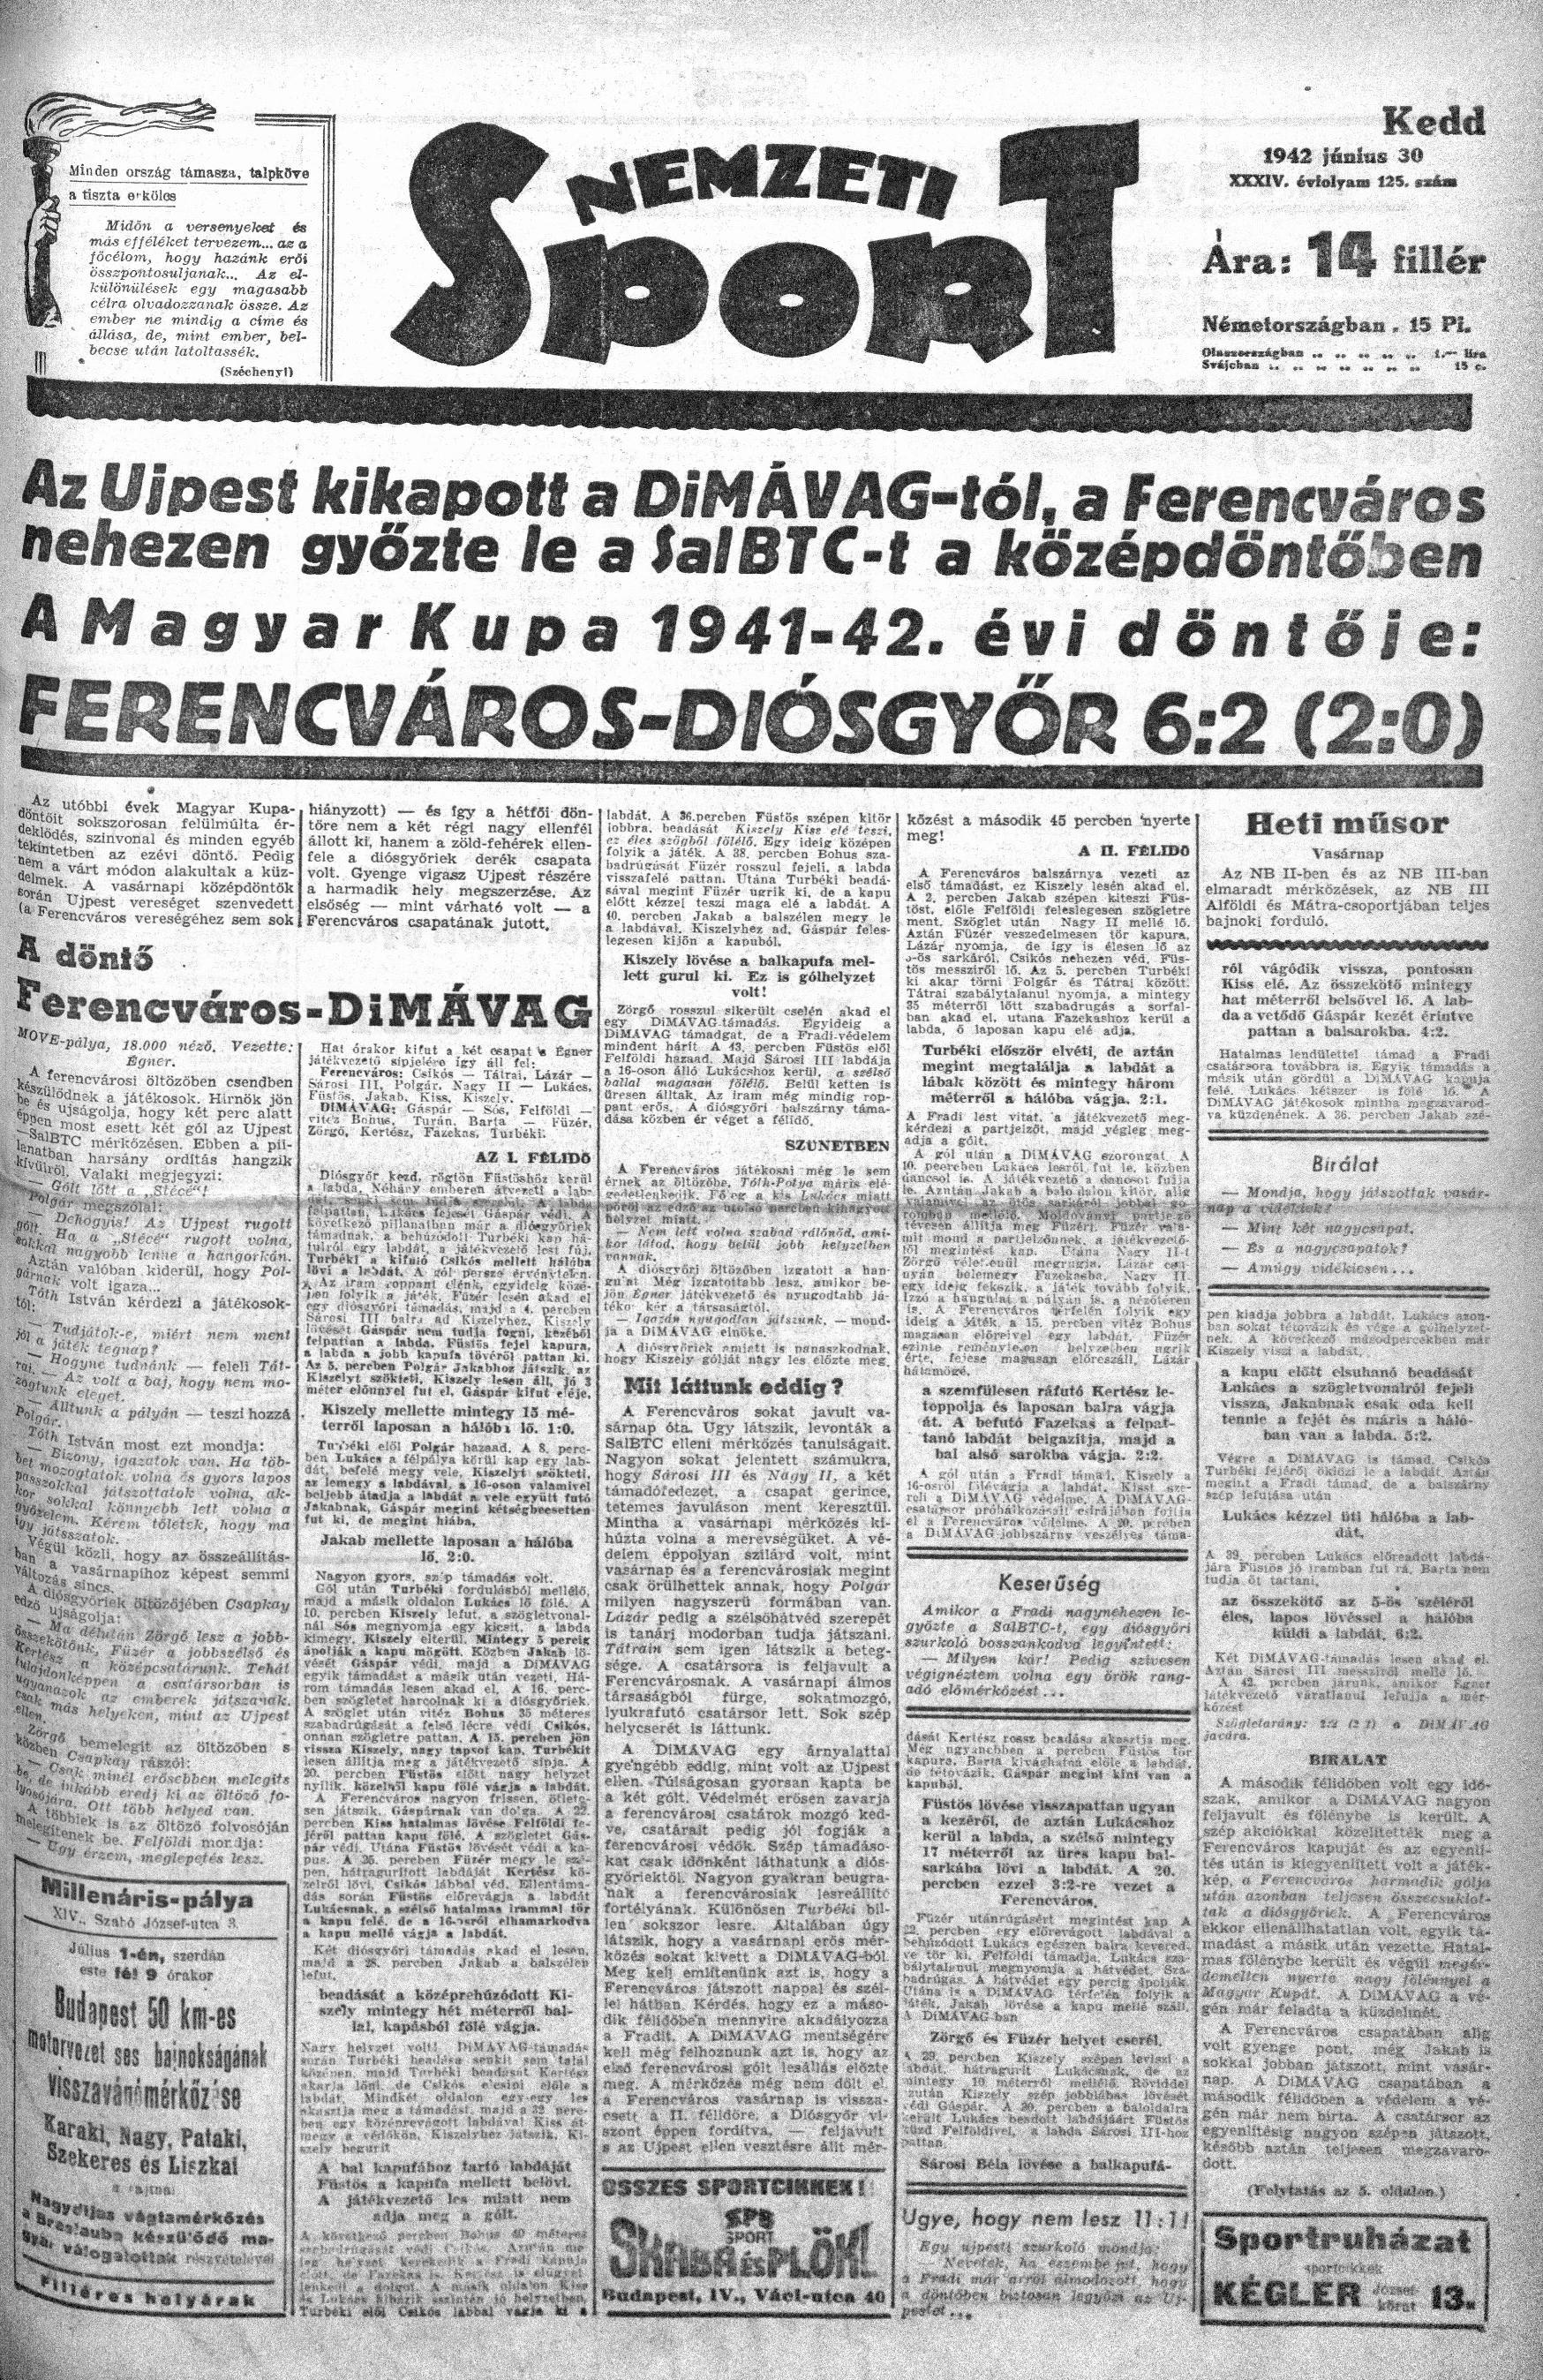 19420630_19420629_01_ferencvaros-diosgyori-mavag_mk